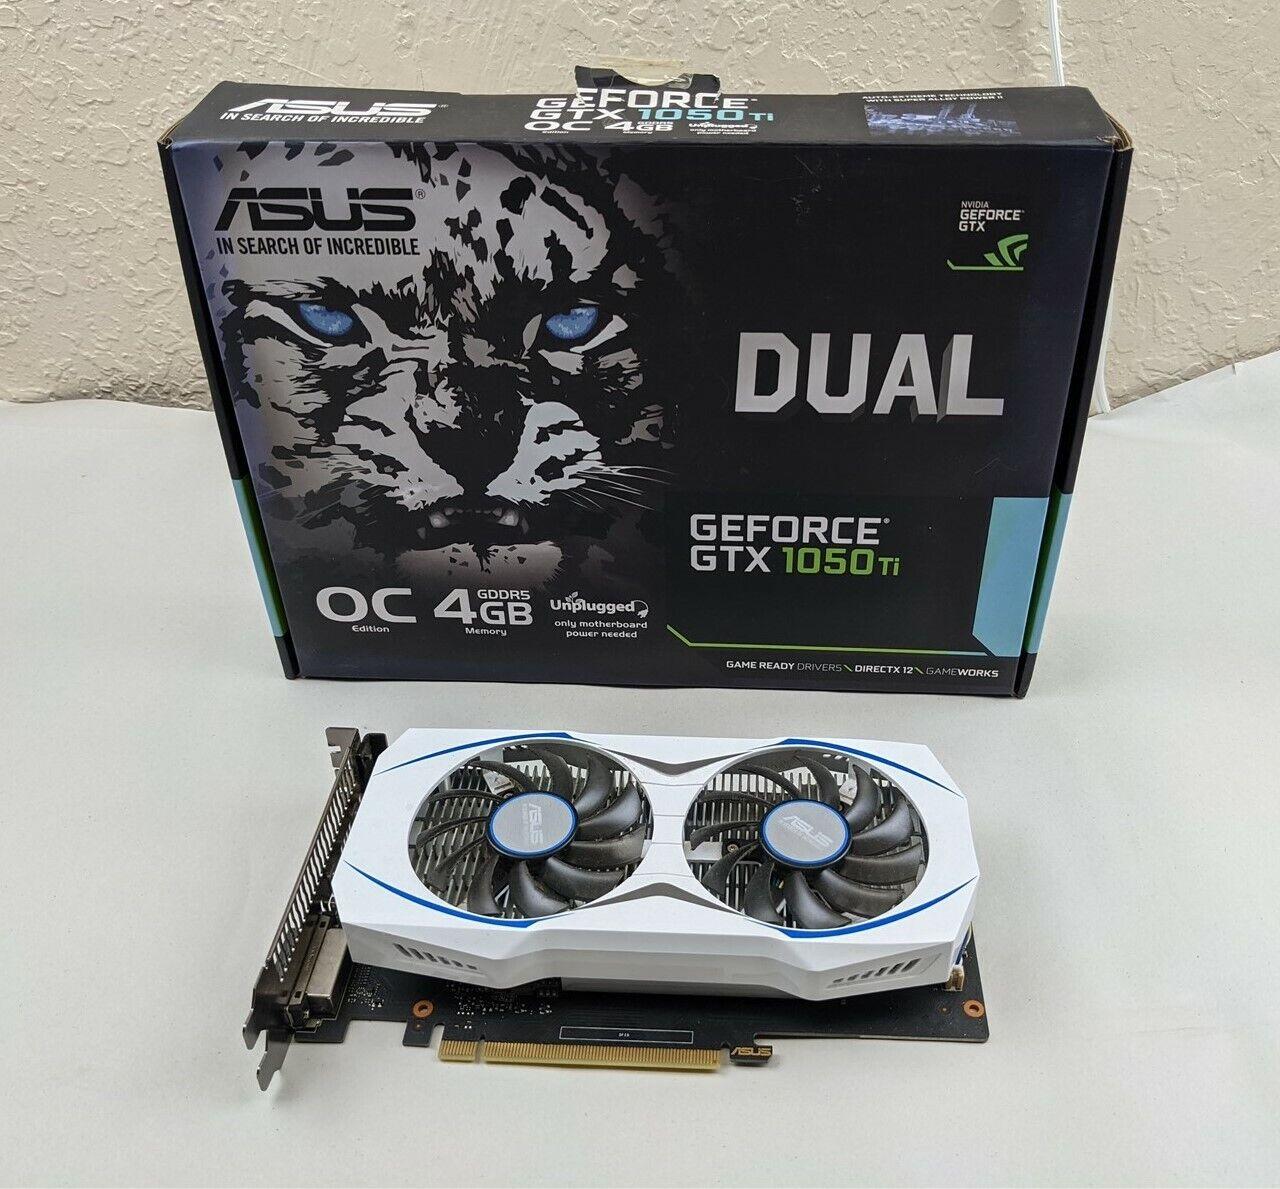 Asus GeForce GTX 1050 Ti 4GB GDDR5 Video Graphics Card DUAL-GTX1050TI-O4G